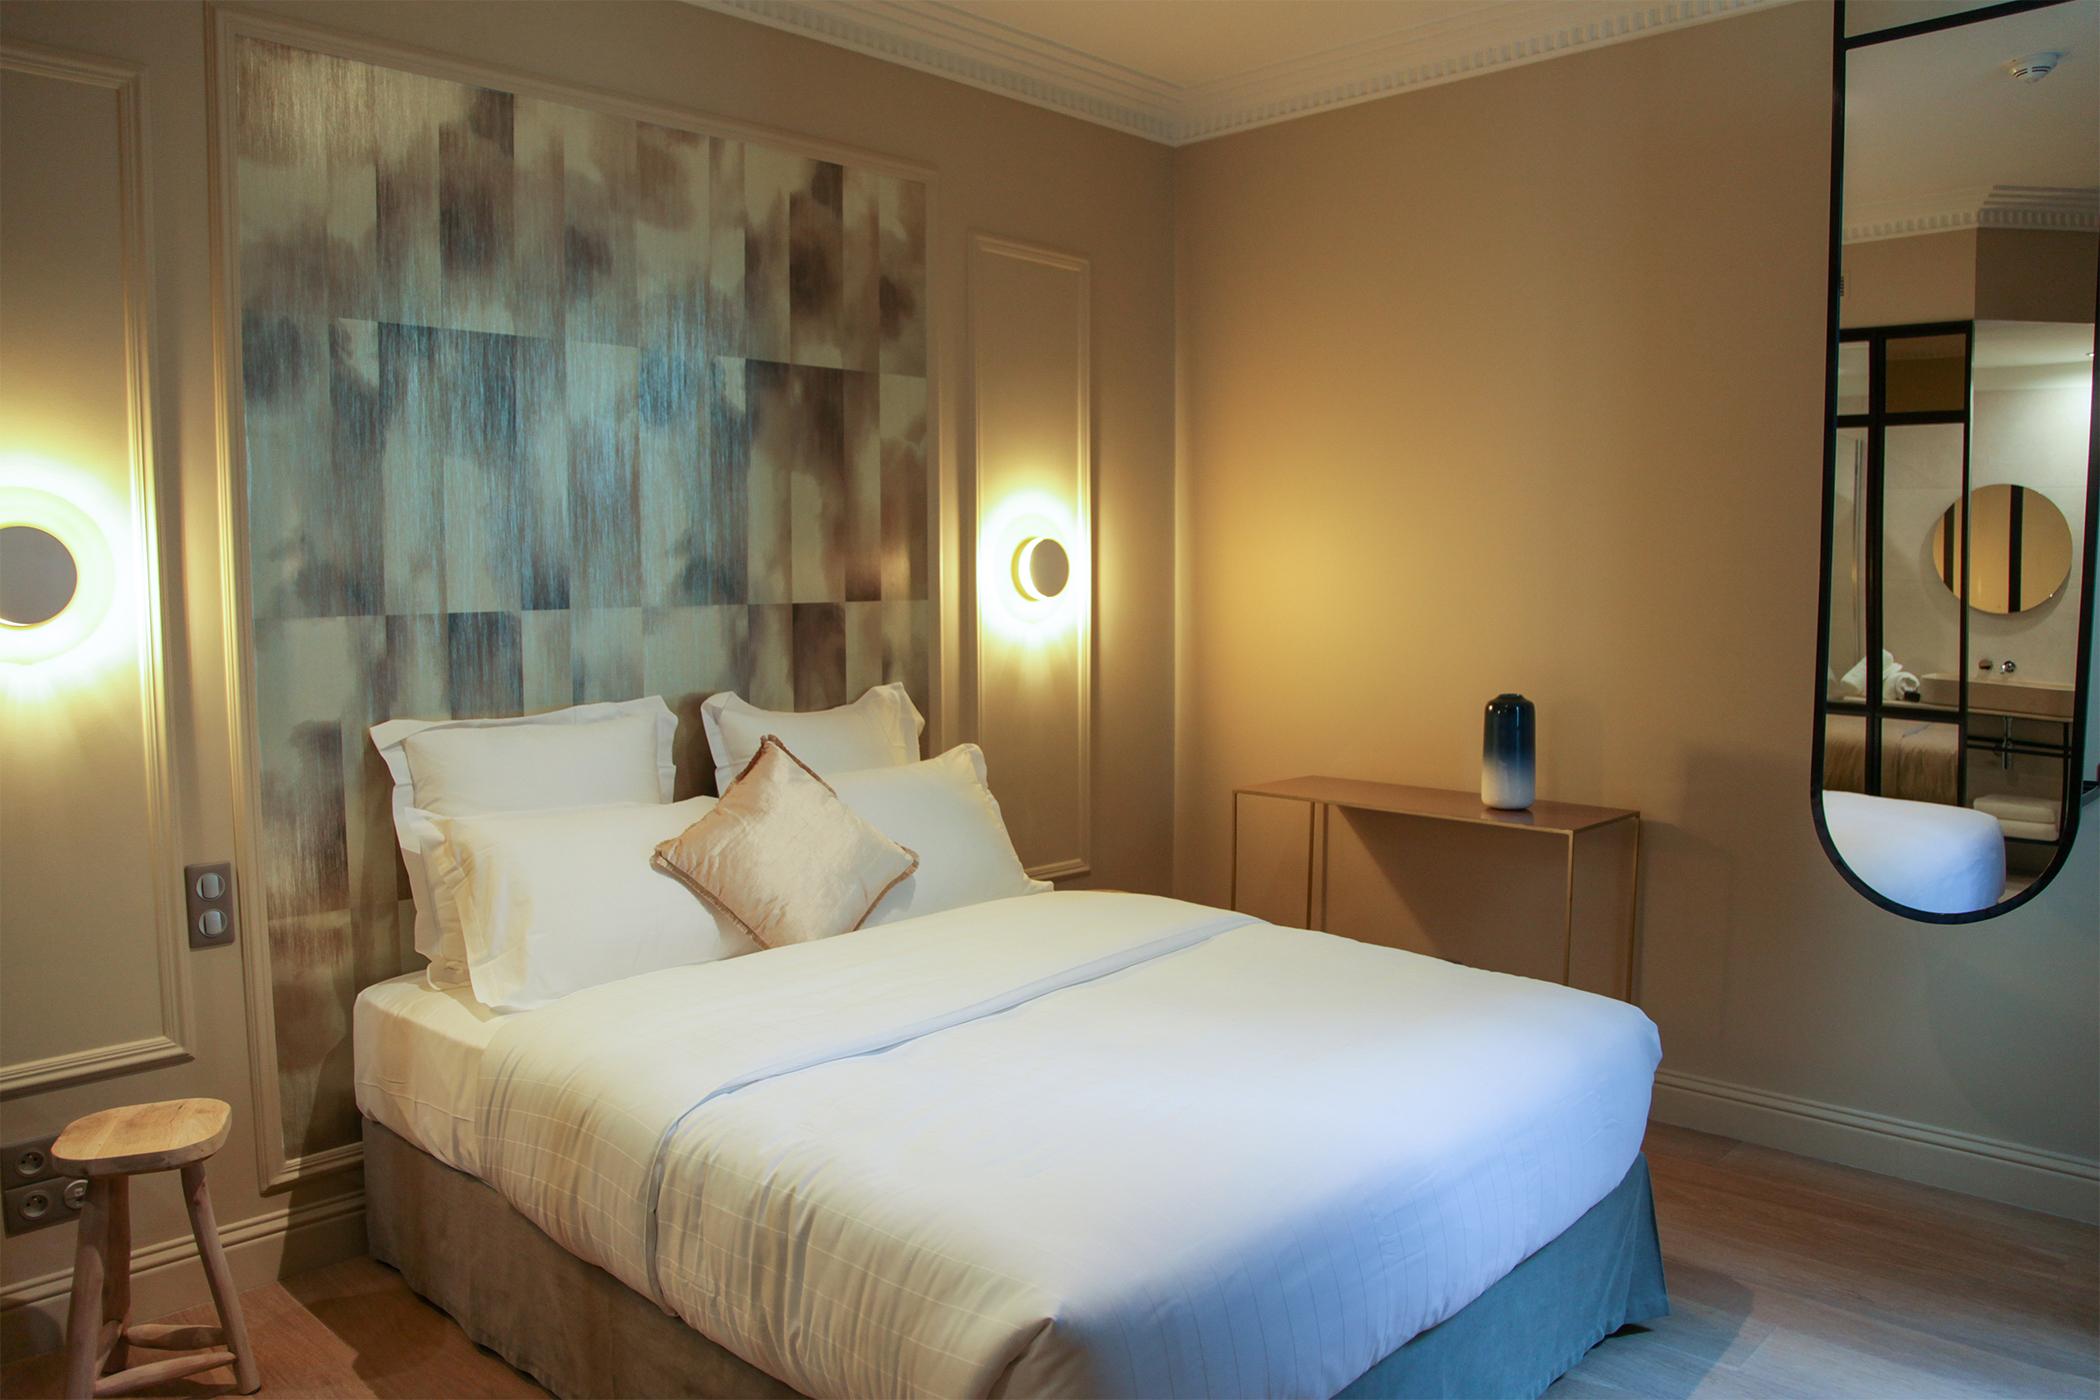 galerie_0008_hotelsingulier-17